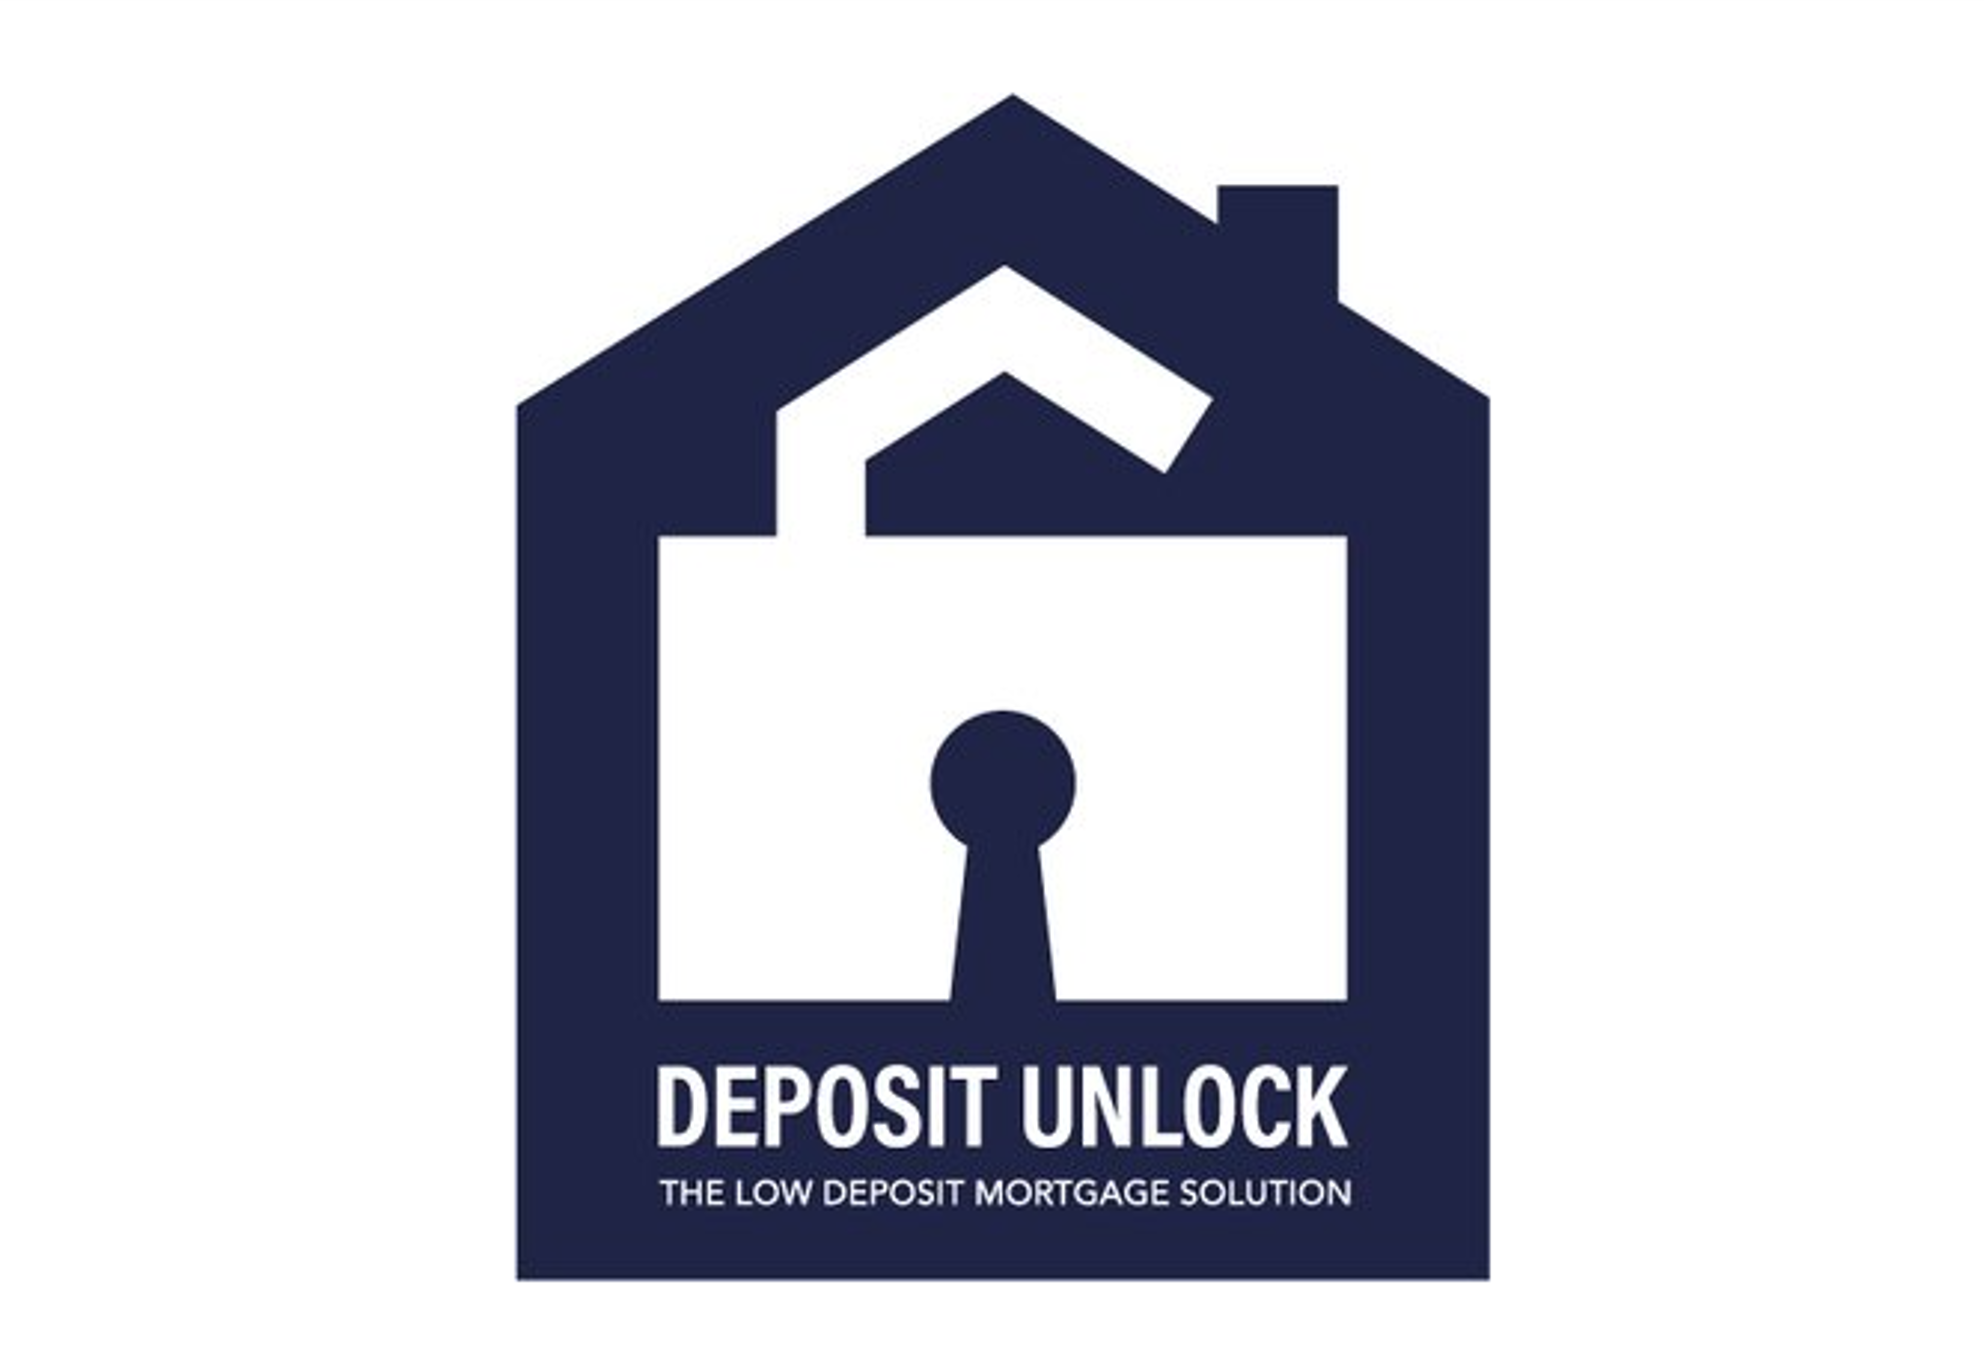 Image of Deposit unlock the low deposit mortgage solution 95% LTV twindig anthony codling